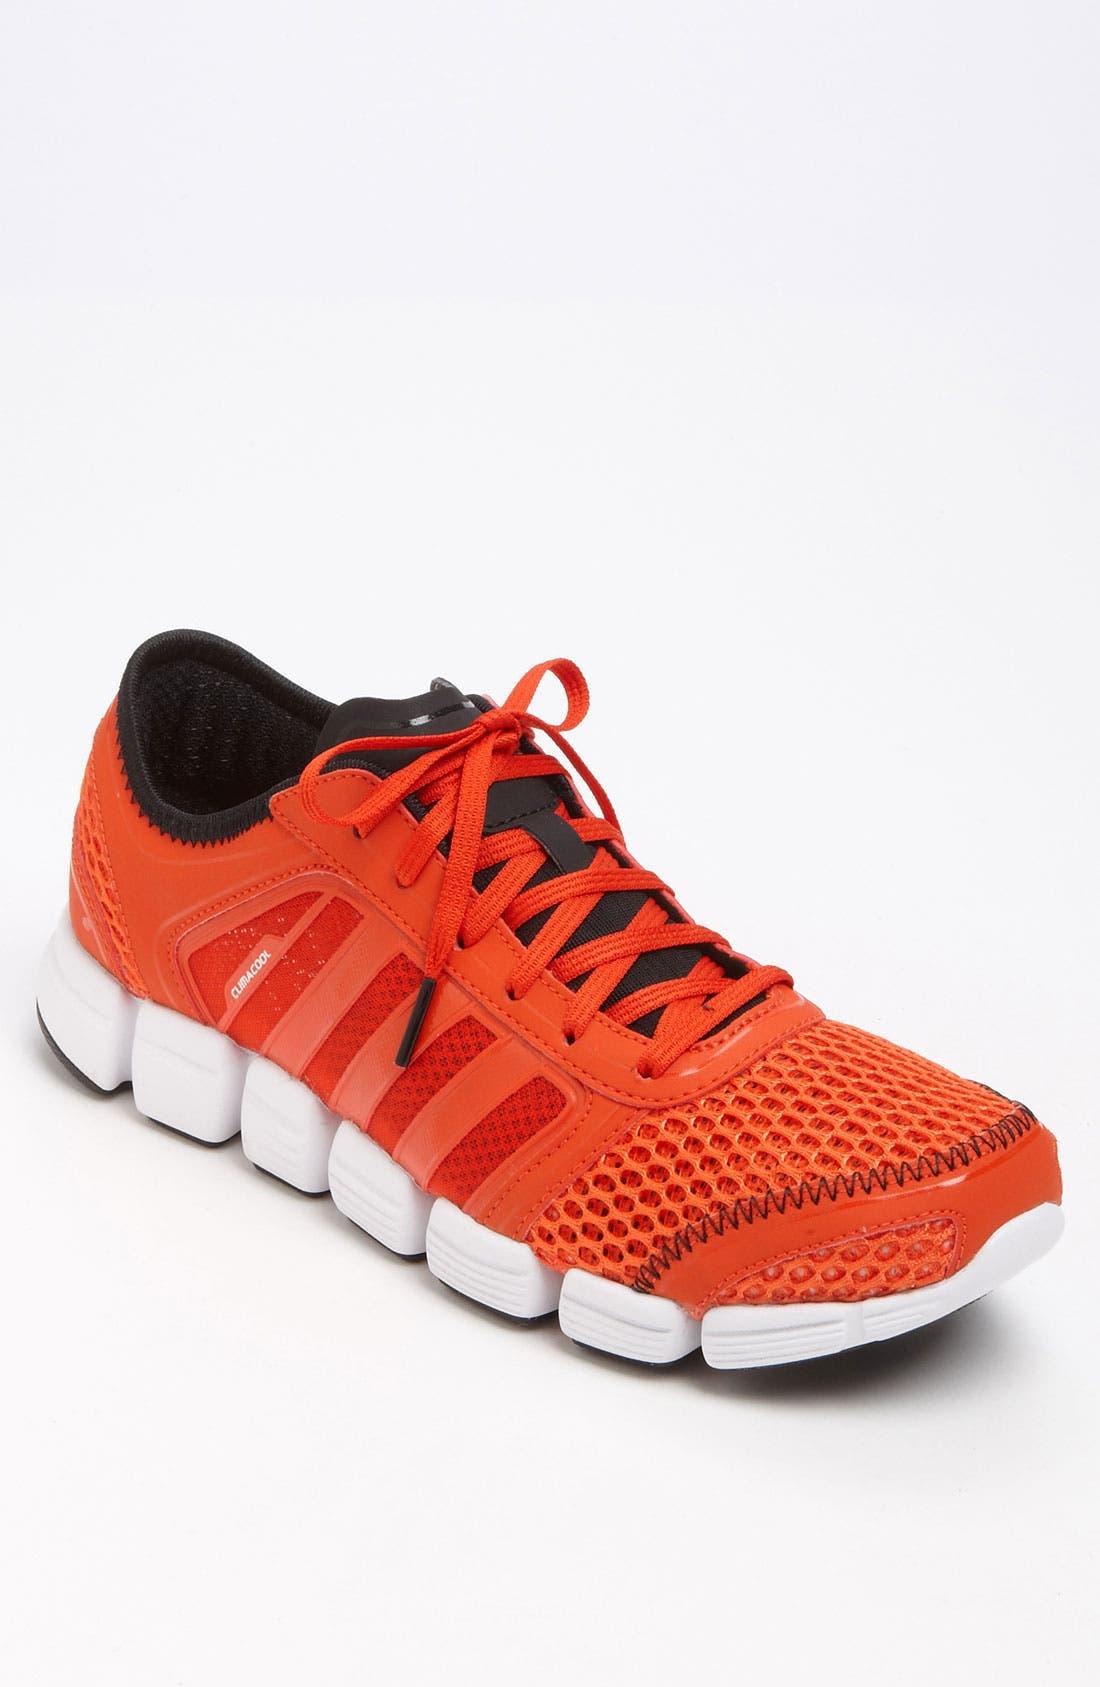 Alternate Image 1 Selected - adidas 'Oscillation' Running Shoe (Men)